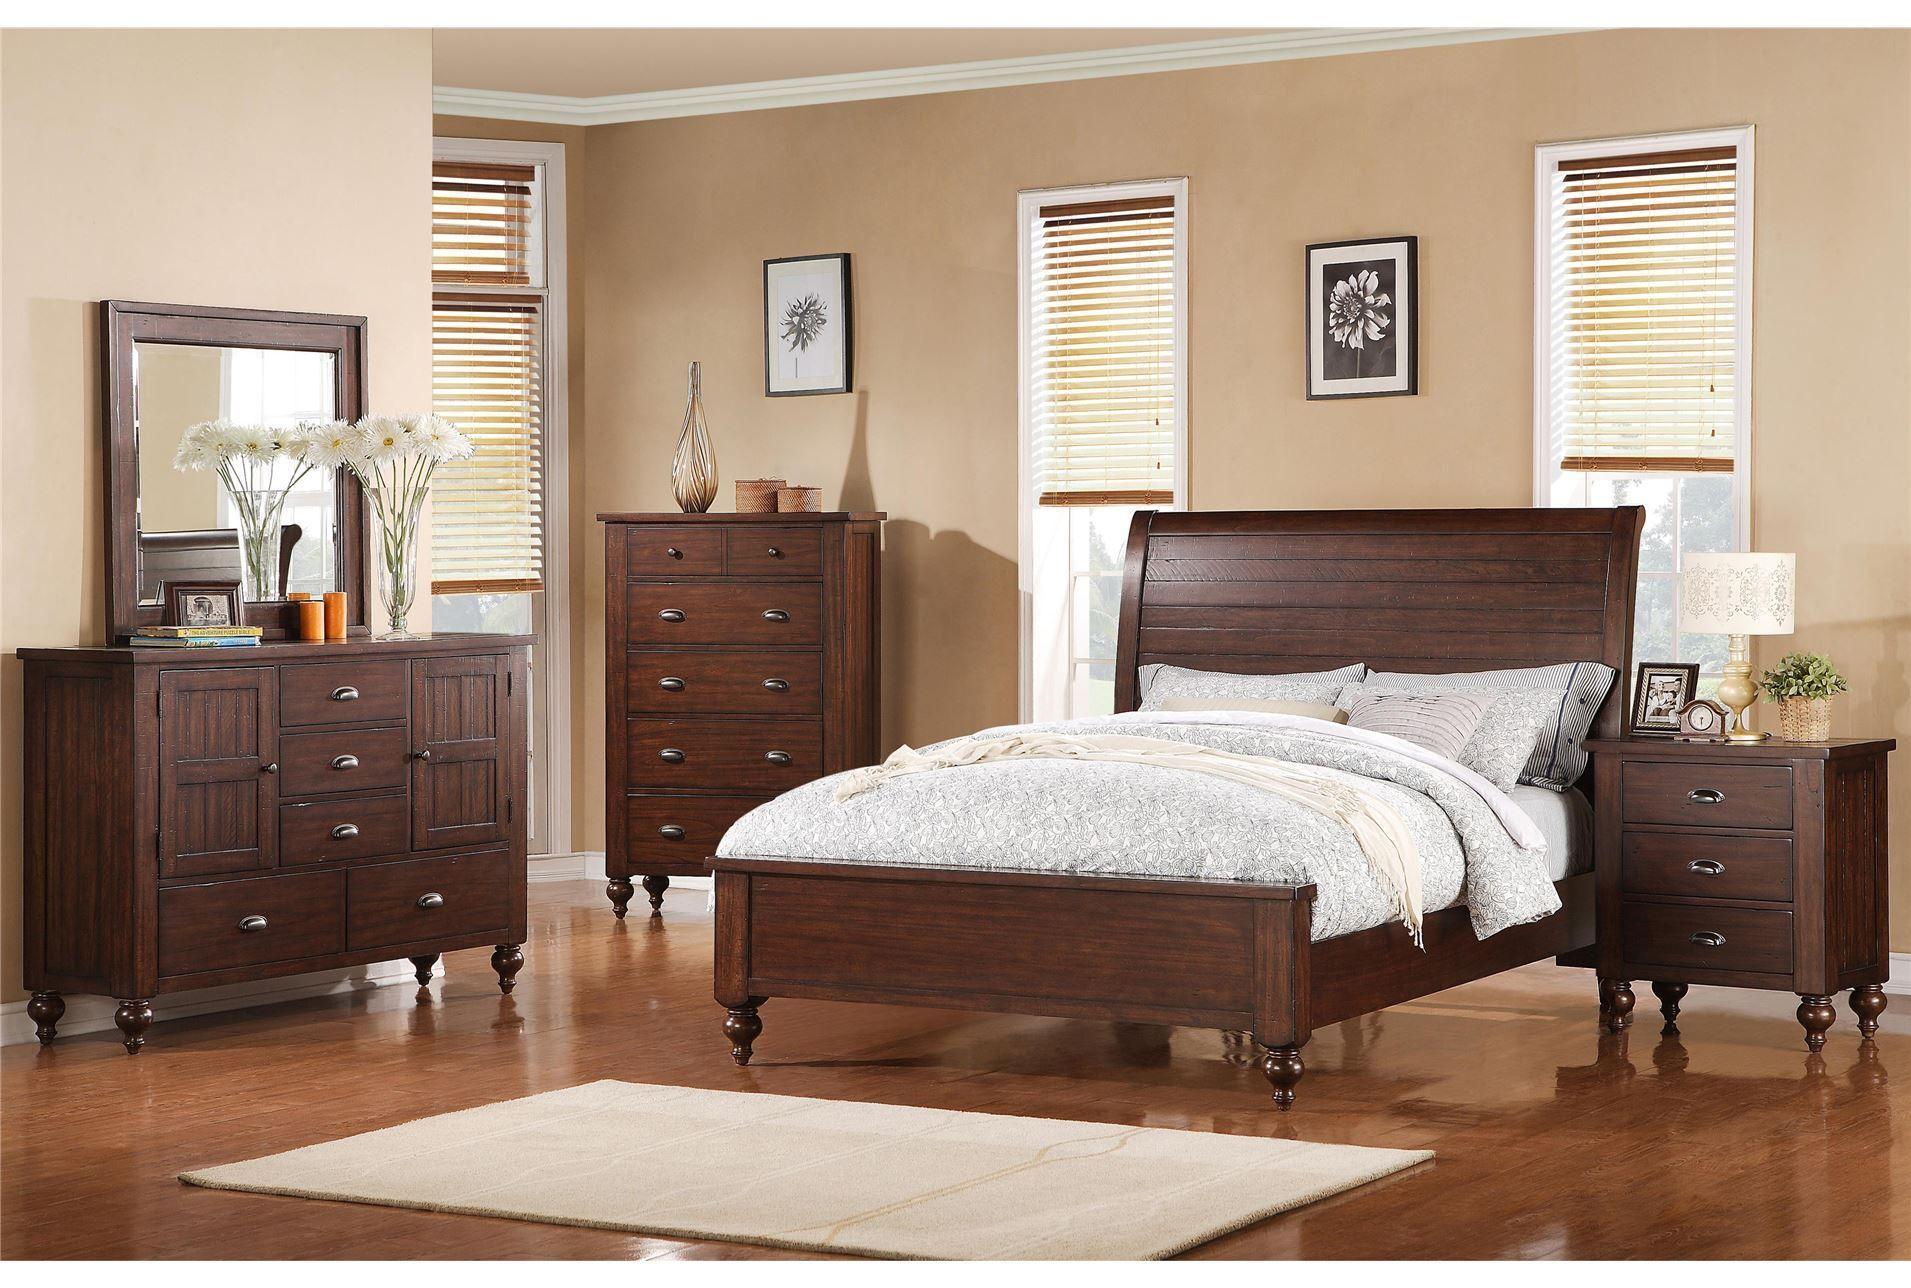 Cullen Eastern King Panel Bed Furniture, King storage